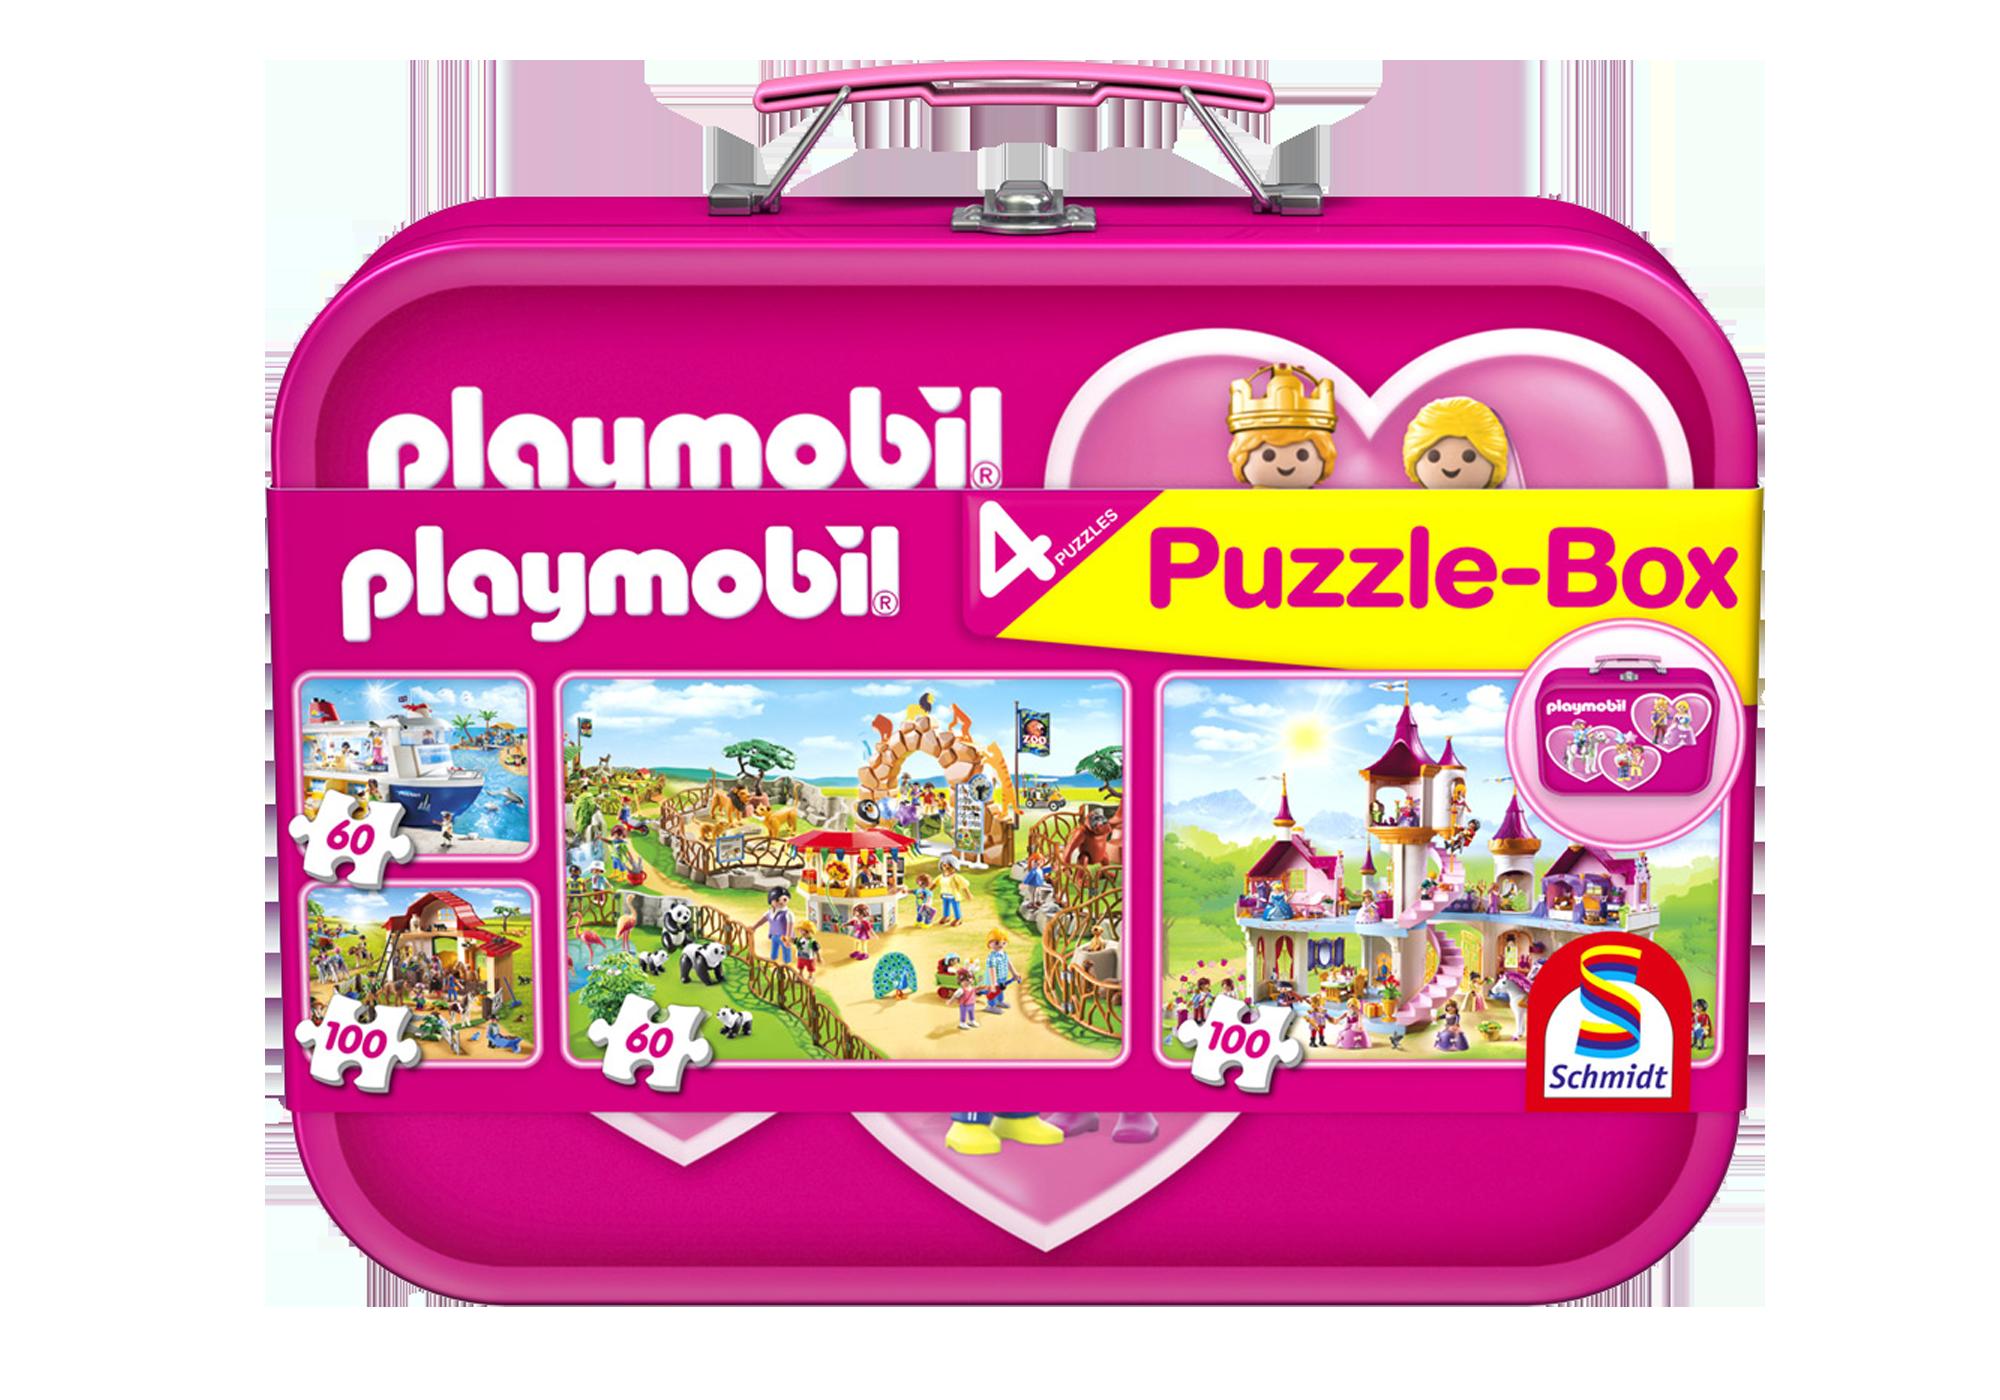 http://media.playmobil.com/i/playmobil/80013_product_detail